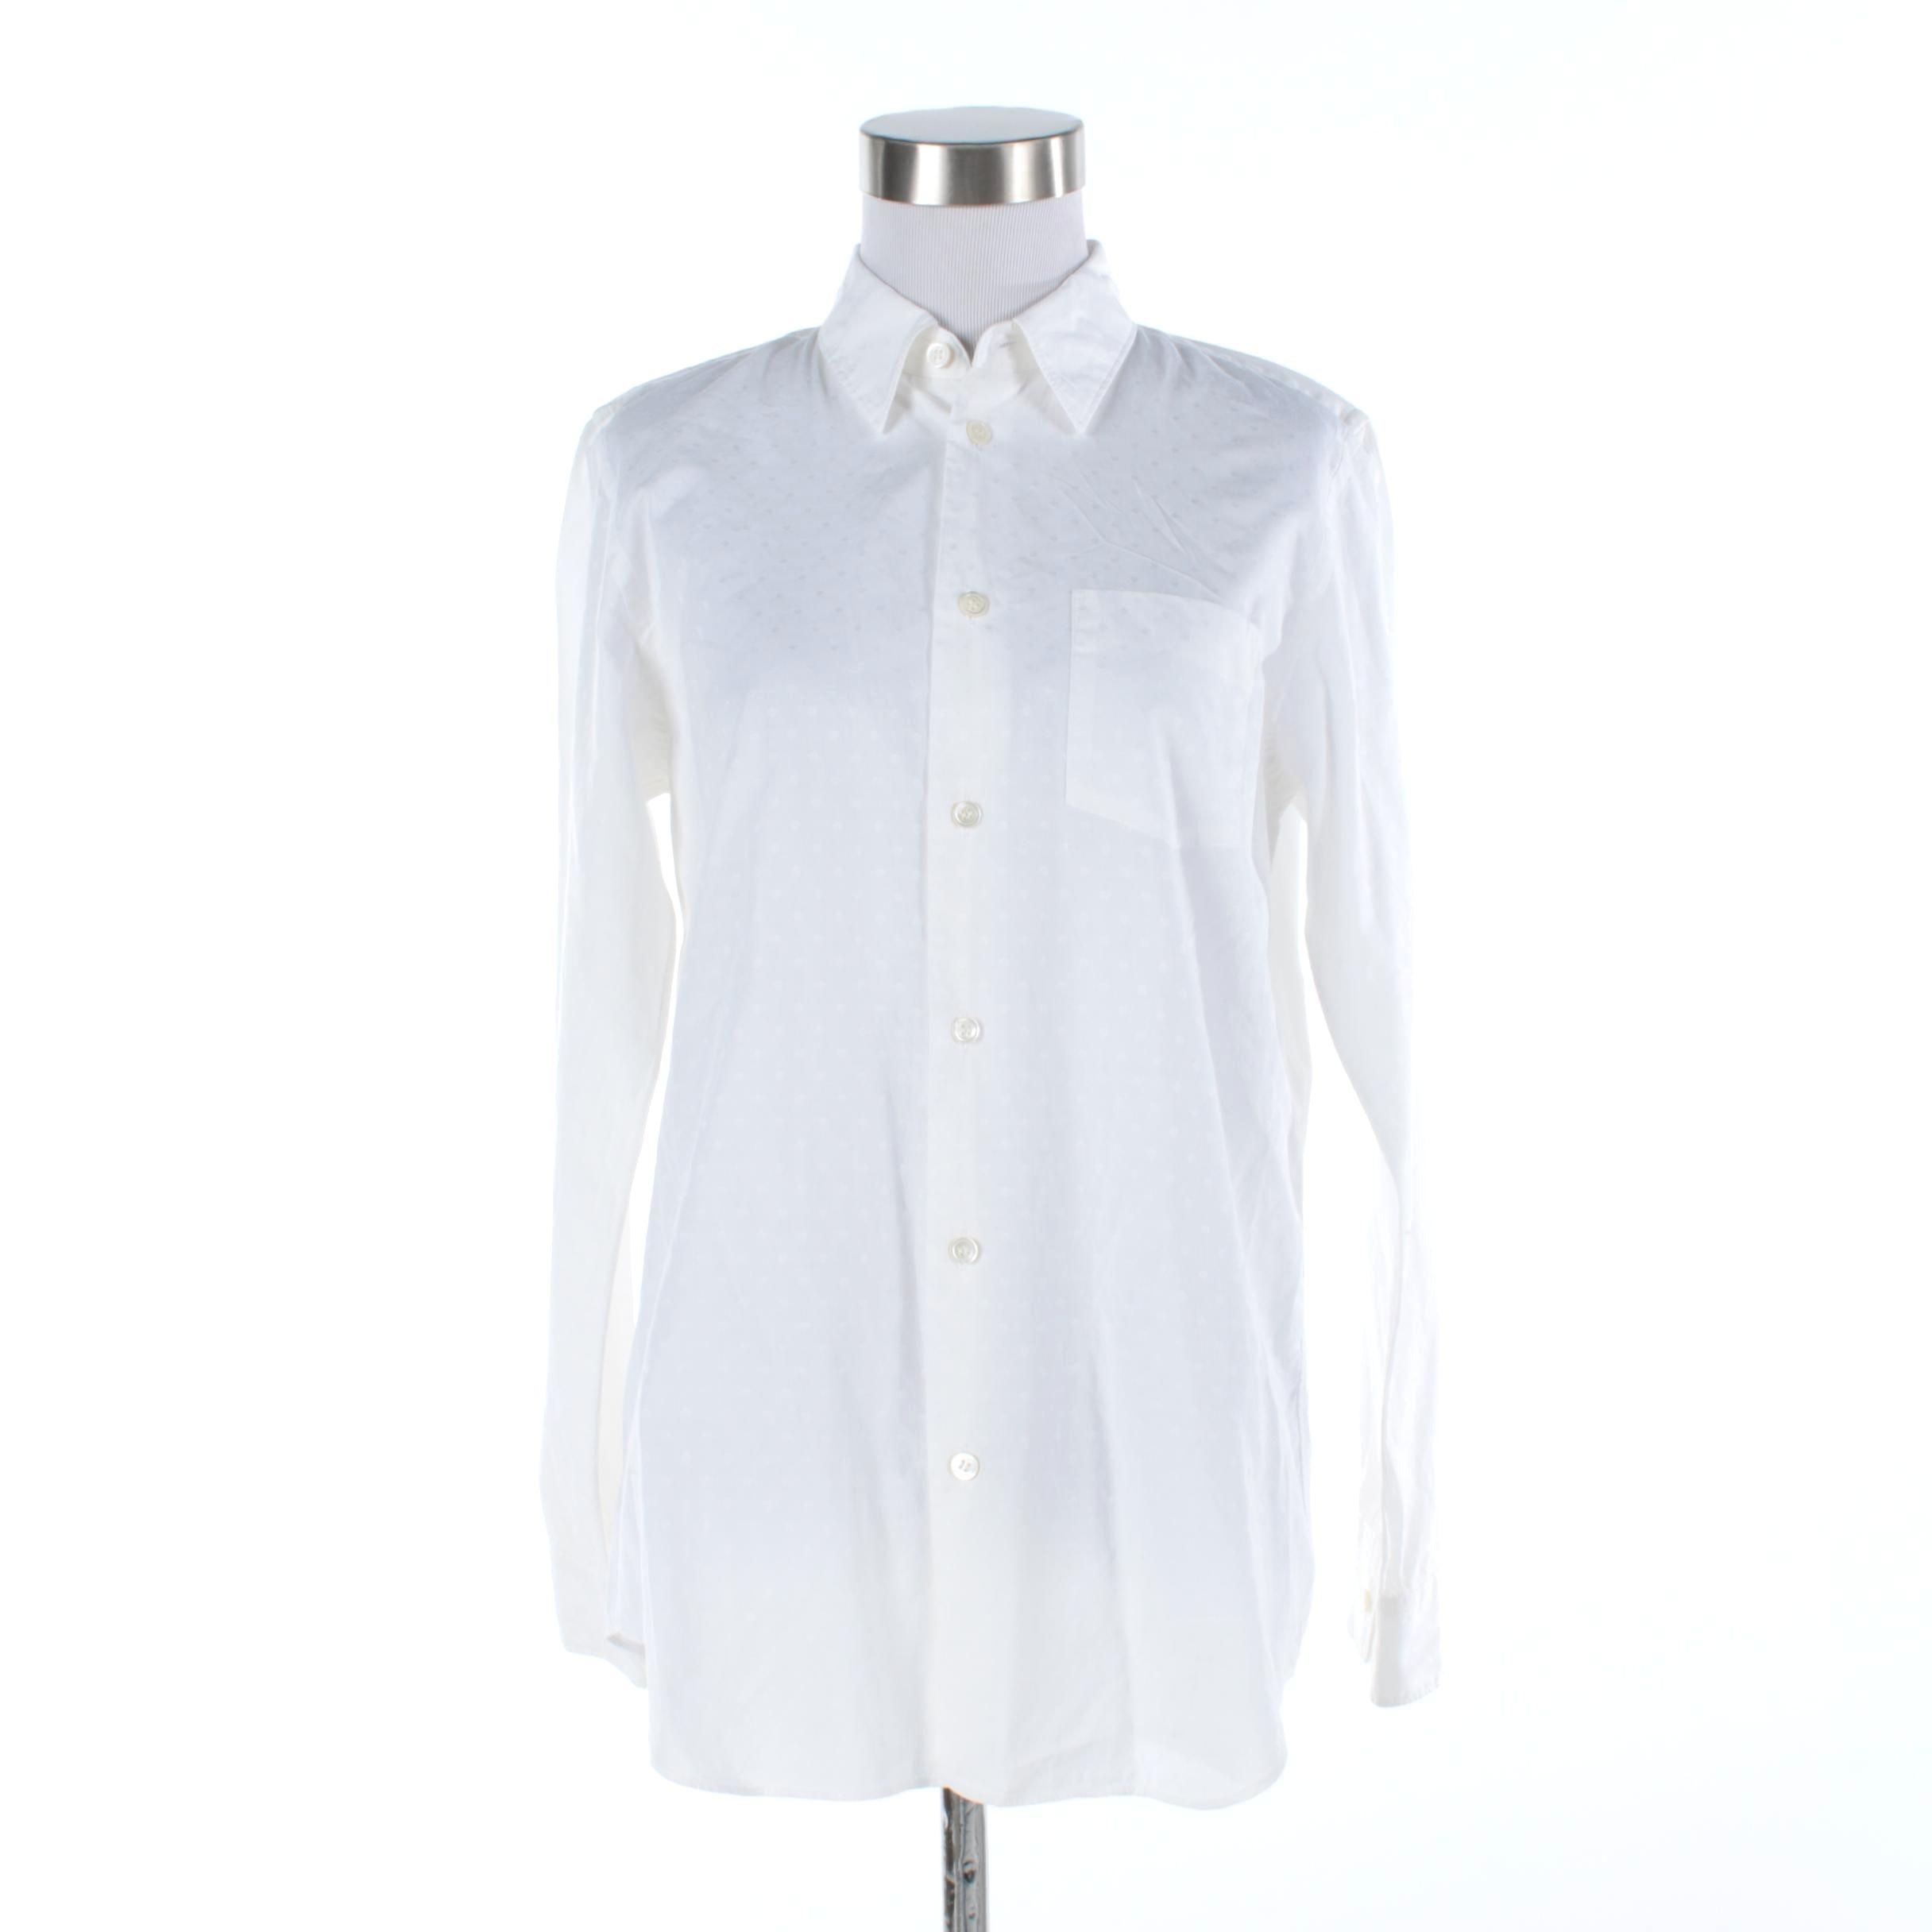 Men's Junya Watanabe White Button-Up Shirt